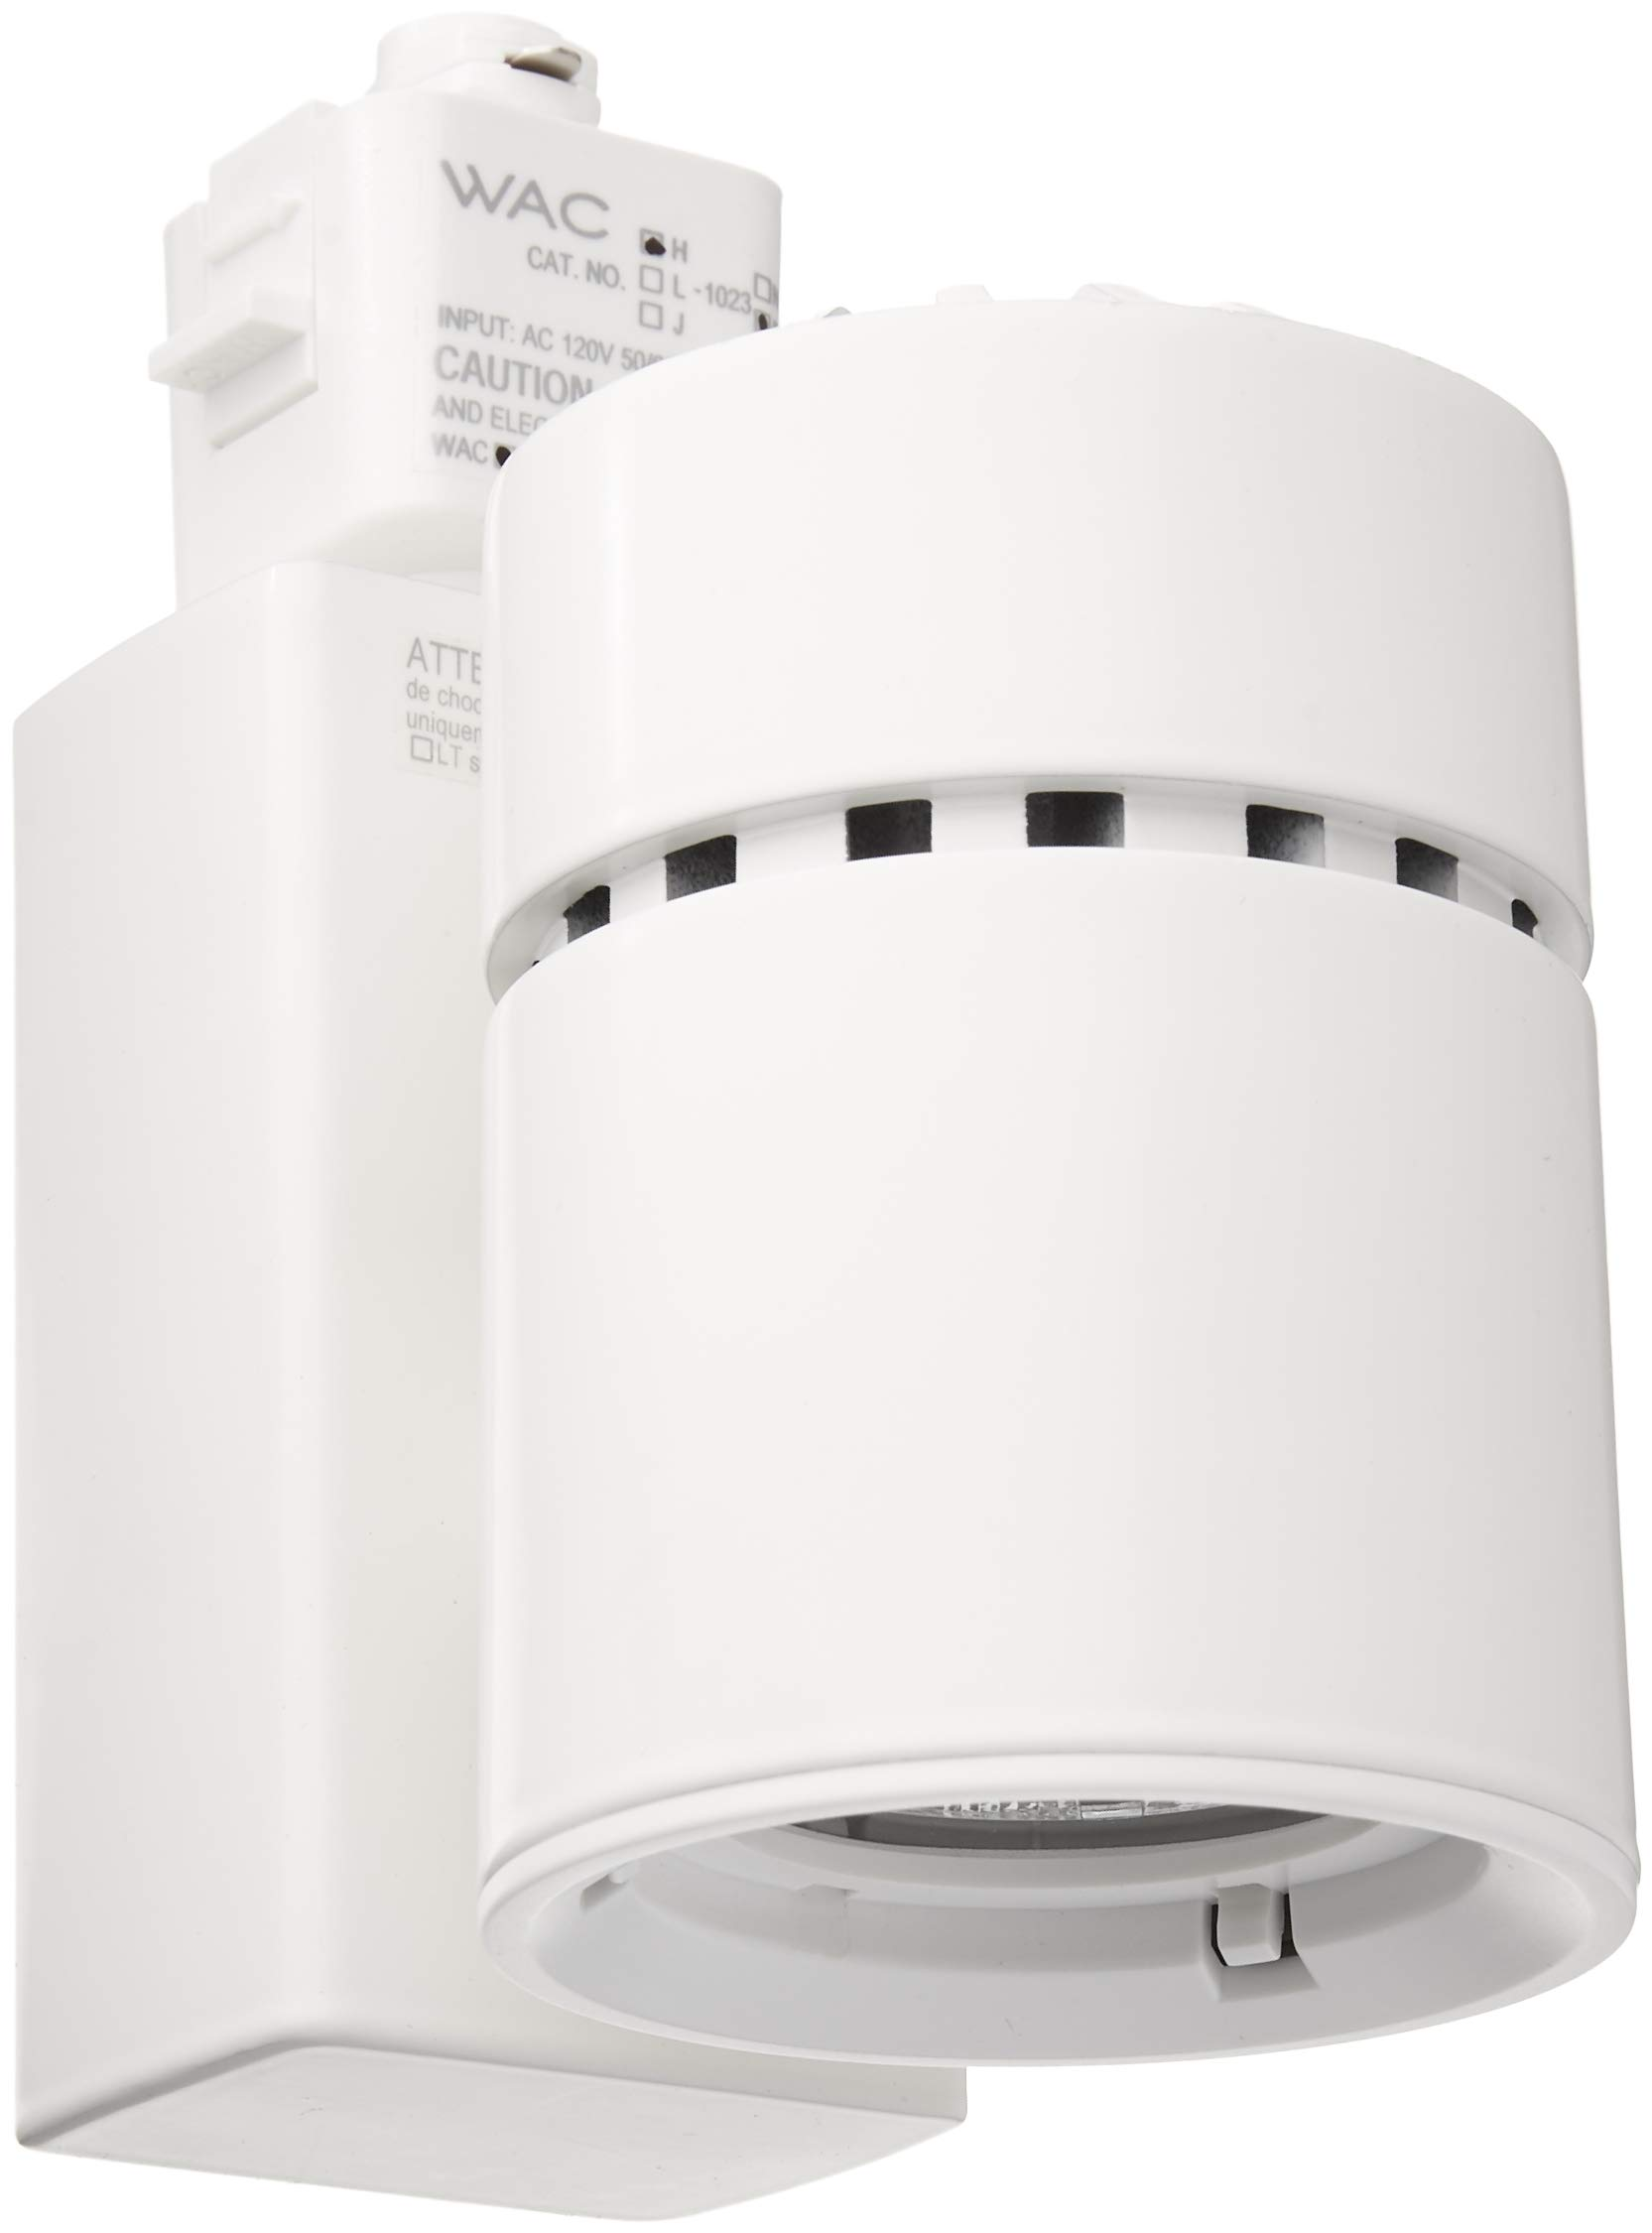 WAC Lighting H-1023F-930-WT H Series LED1023 Exterminator II LED Energy Star Track Head in White Finish, Flood Beam, 90+CRI and 3000K